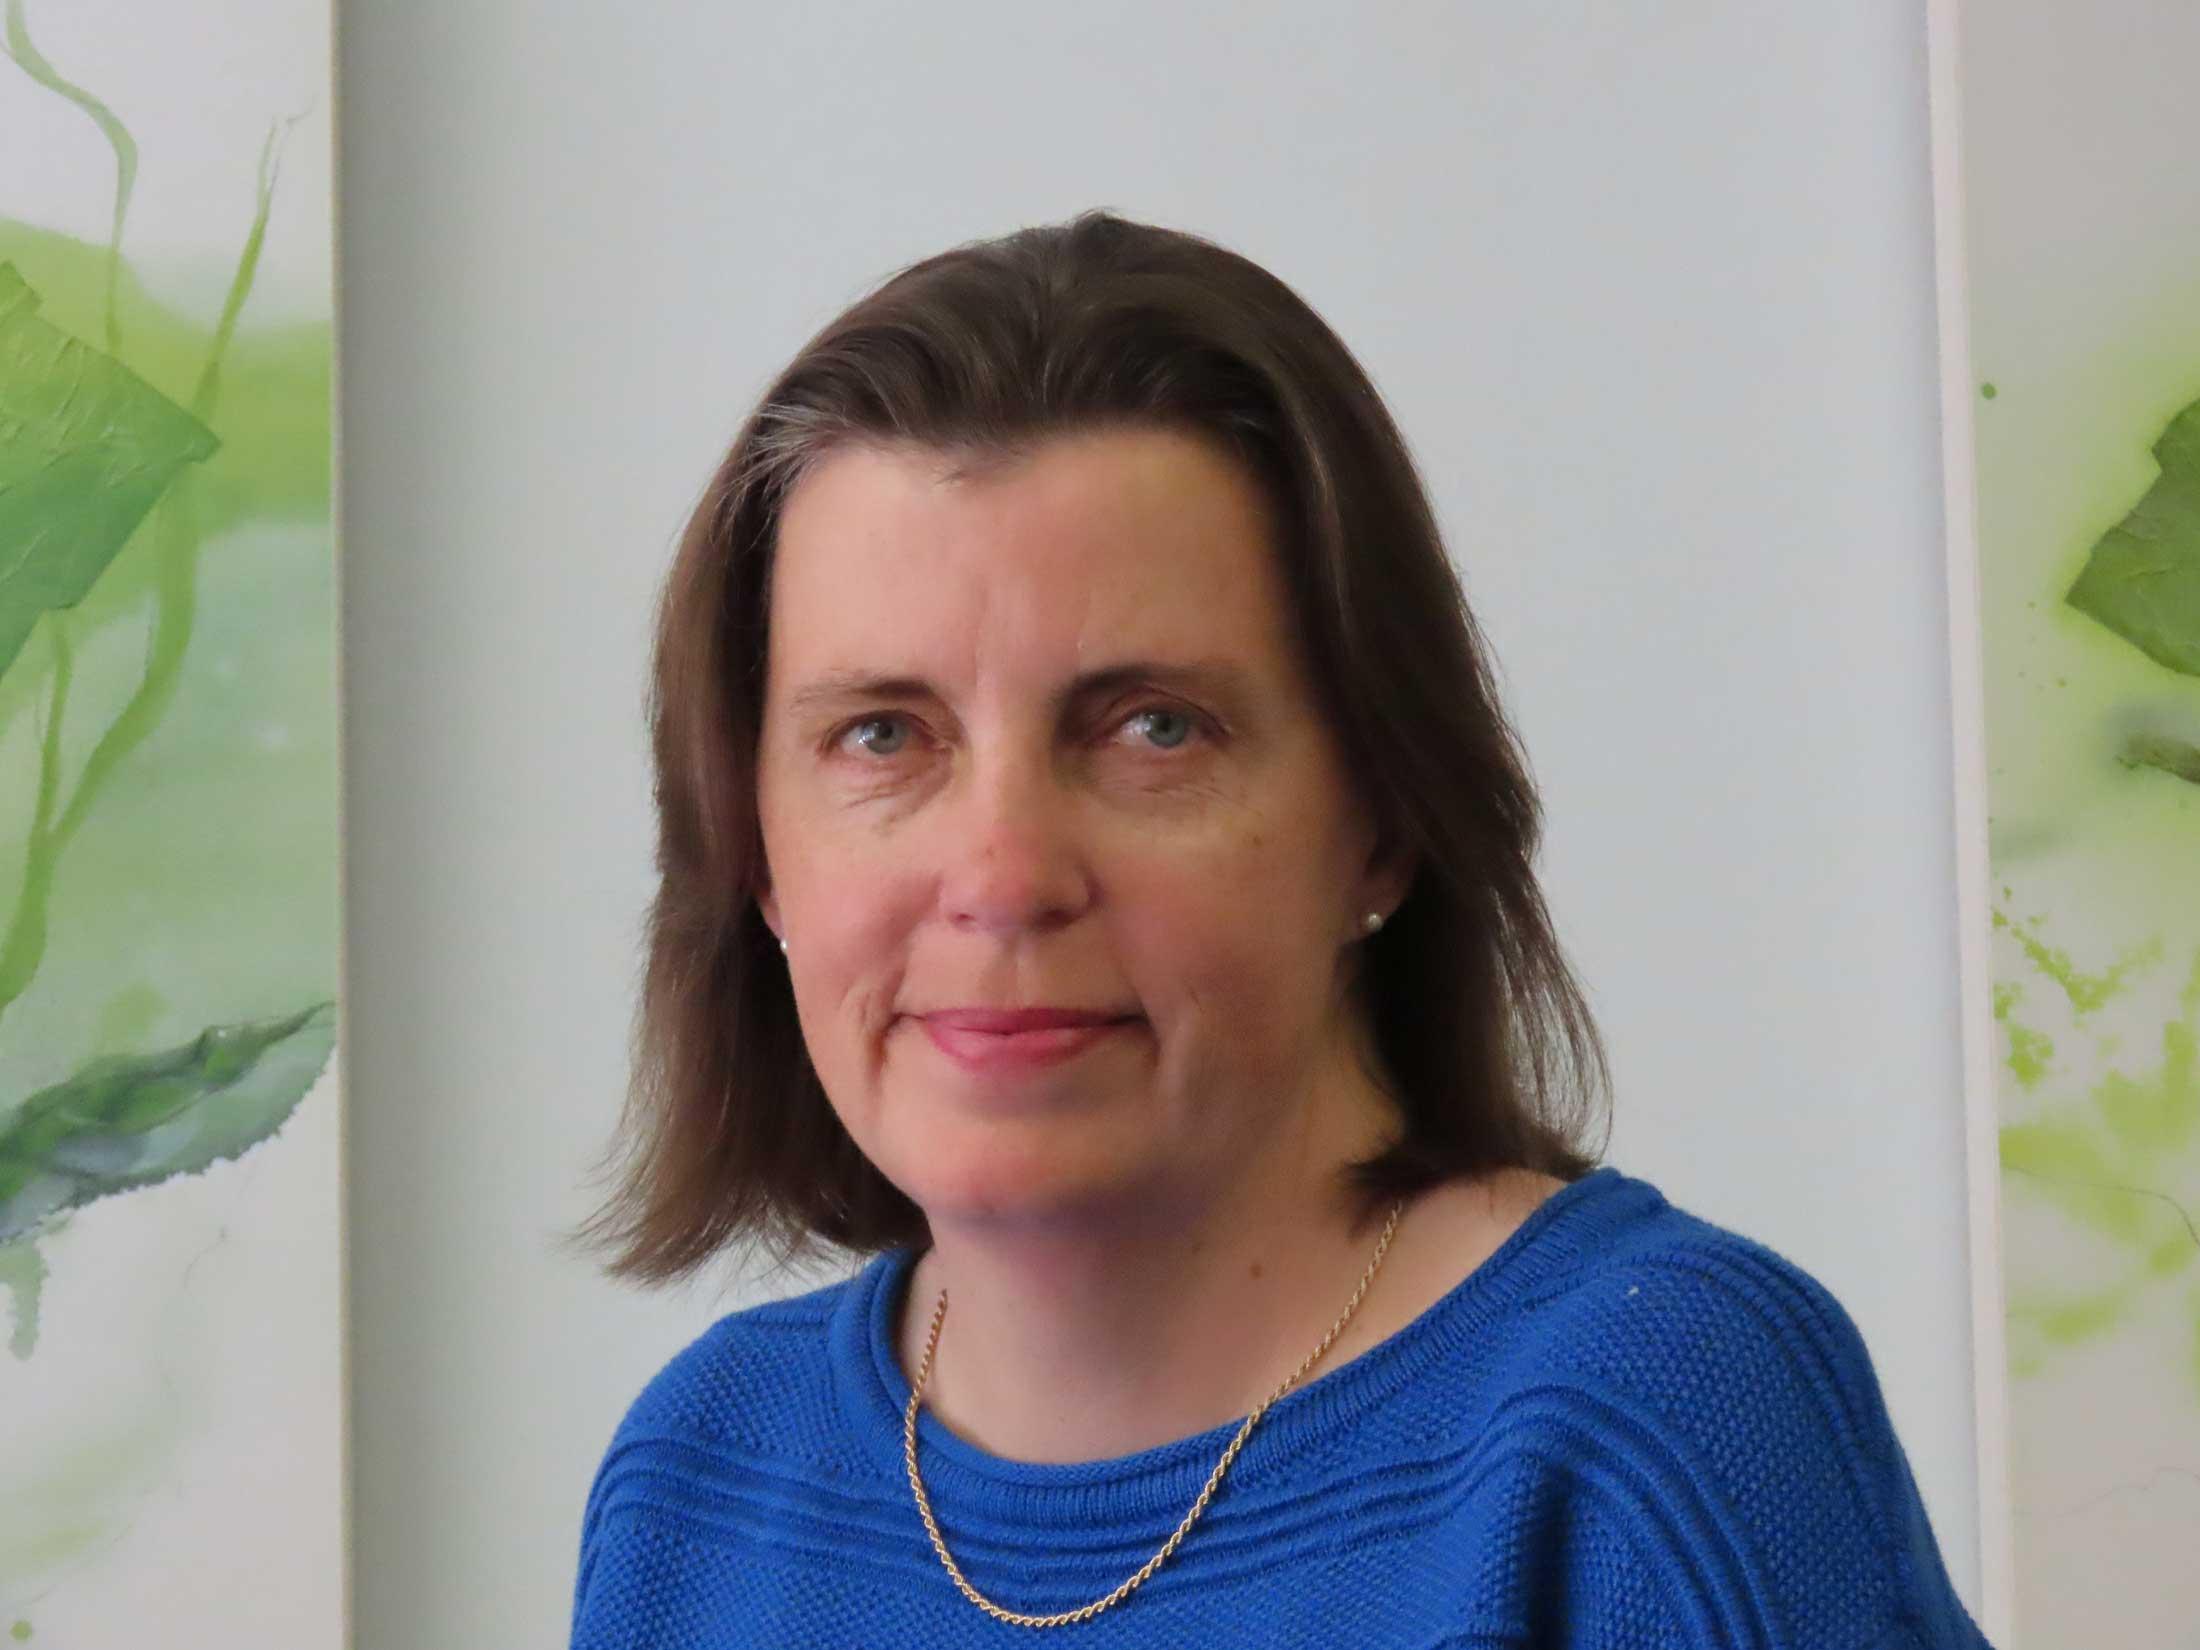 Delia Cann